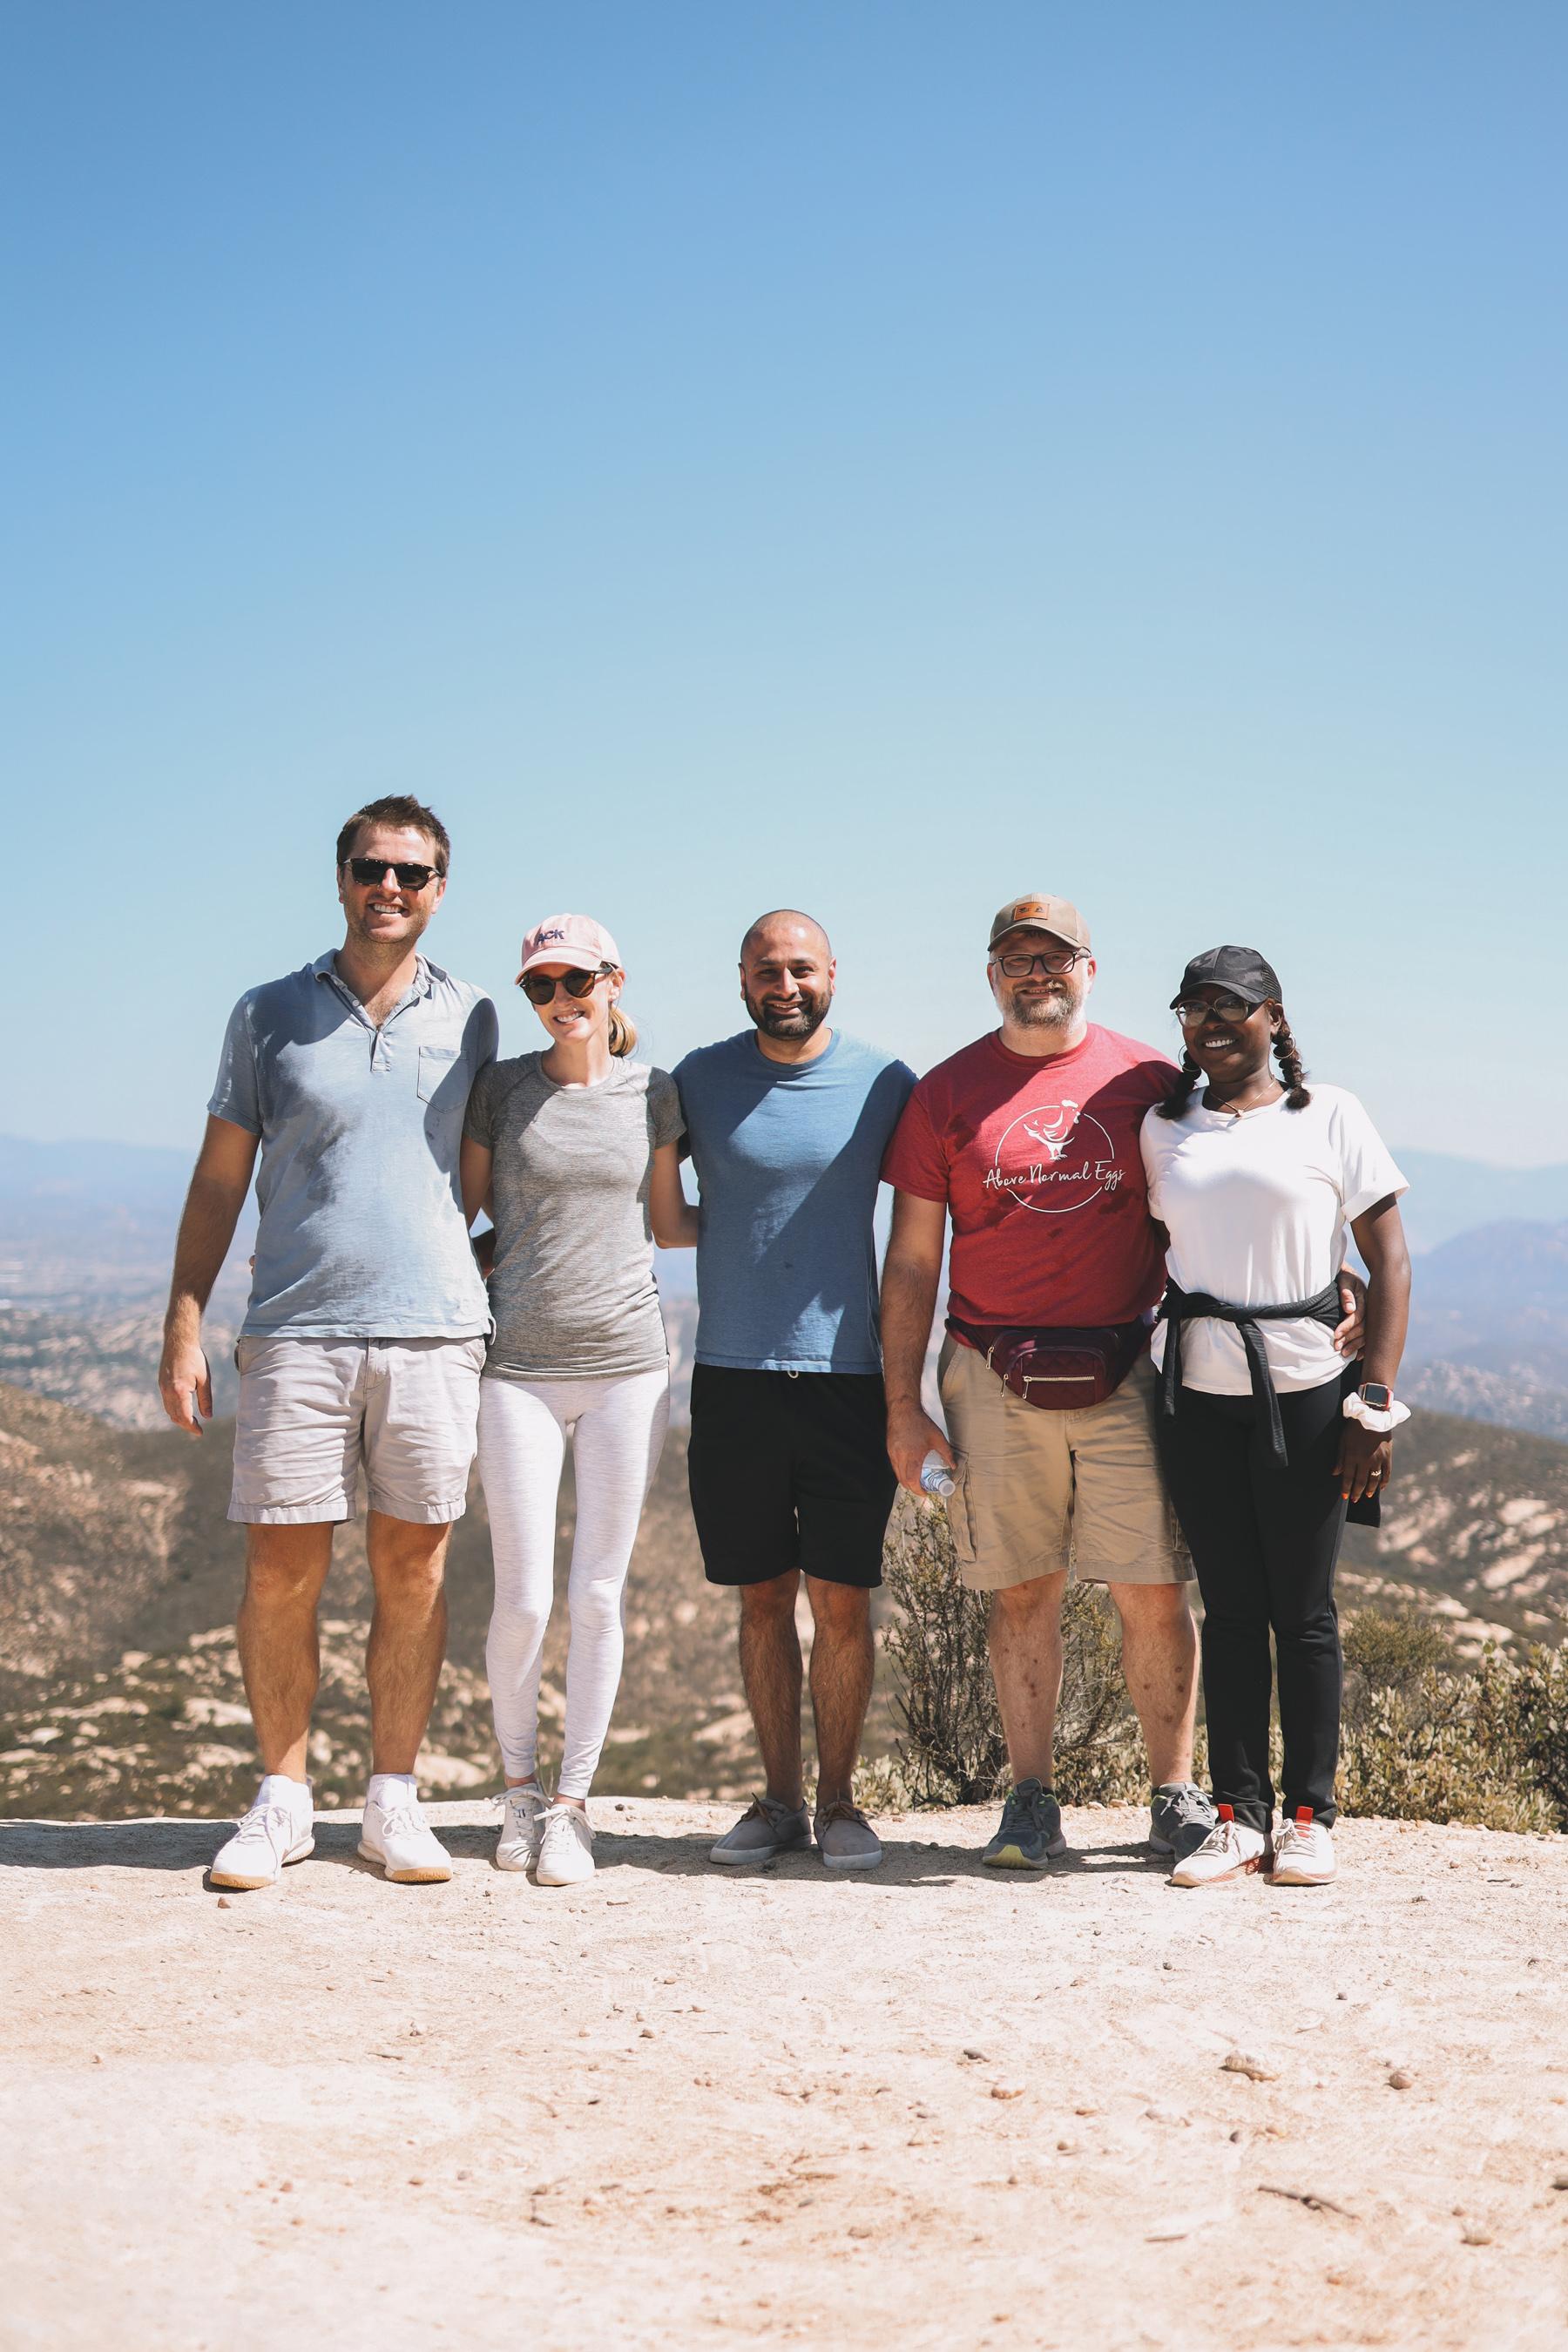 San Diego group hiking trip